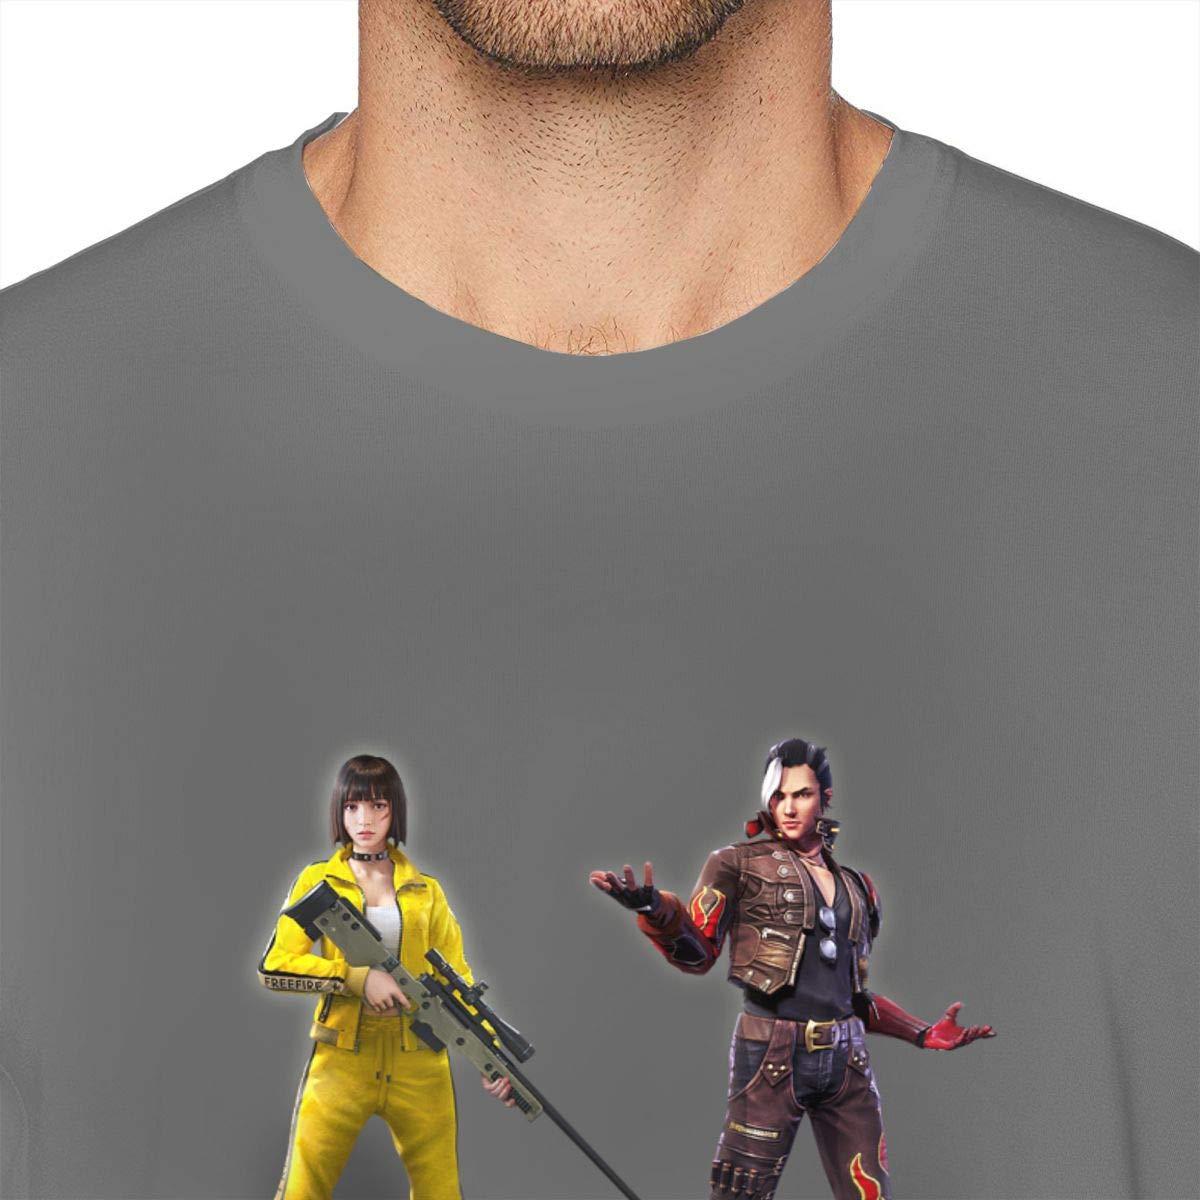 PBQX Free Fire Battlegrounds Mens Casual Short Sleeve Funny Graphic Tee Shirts Black